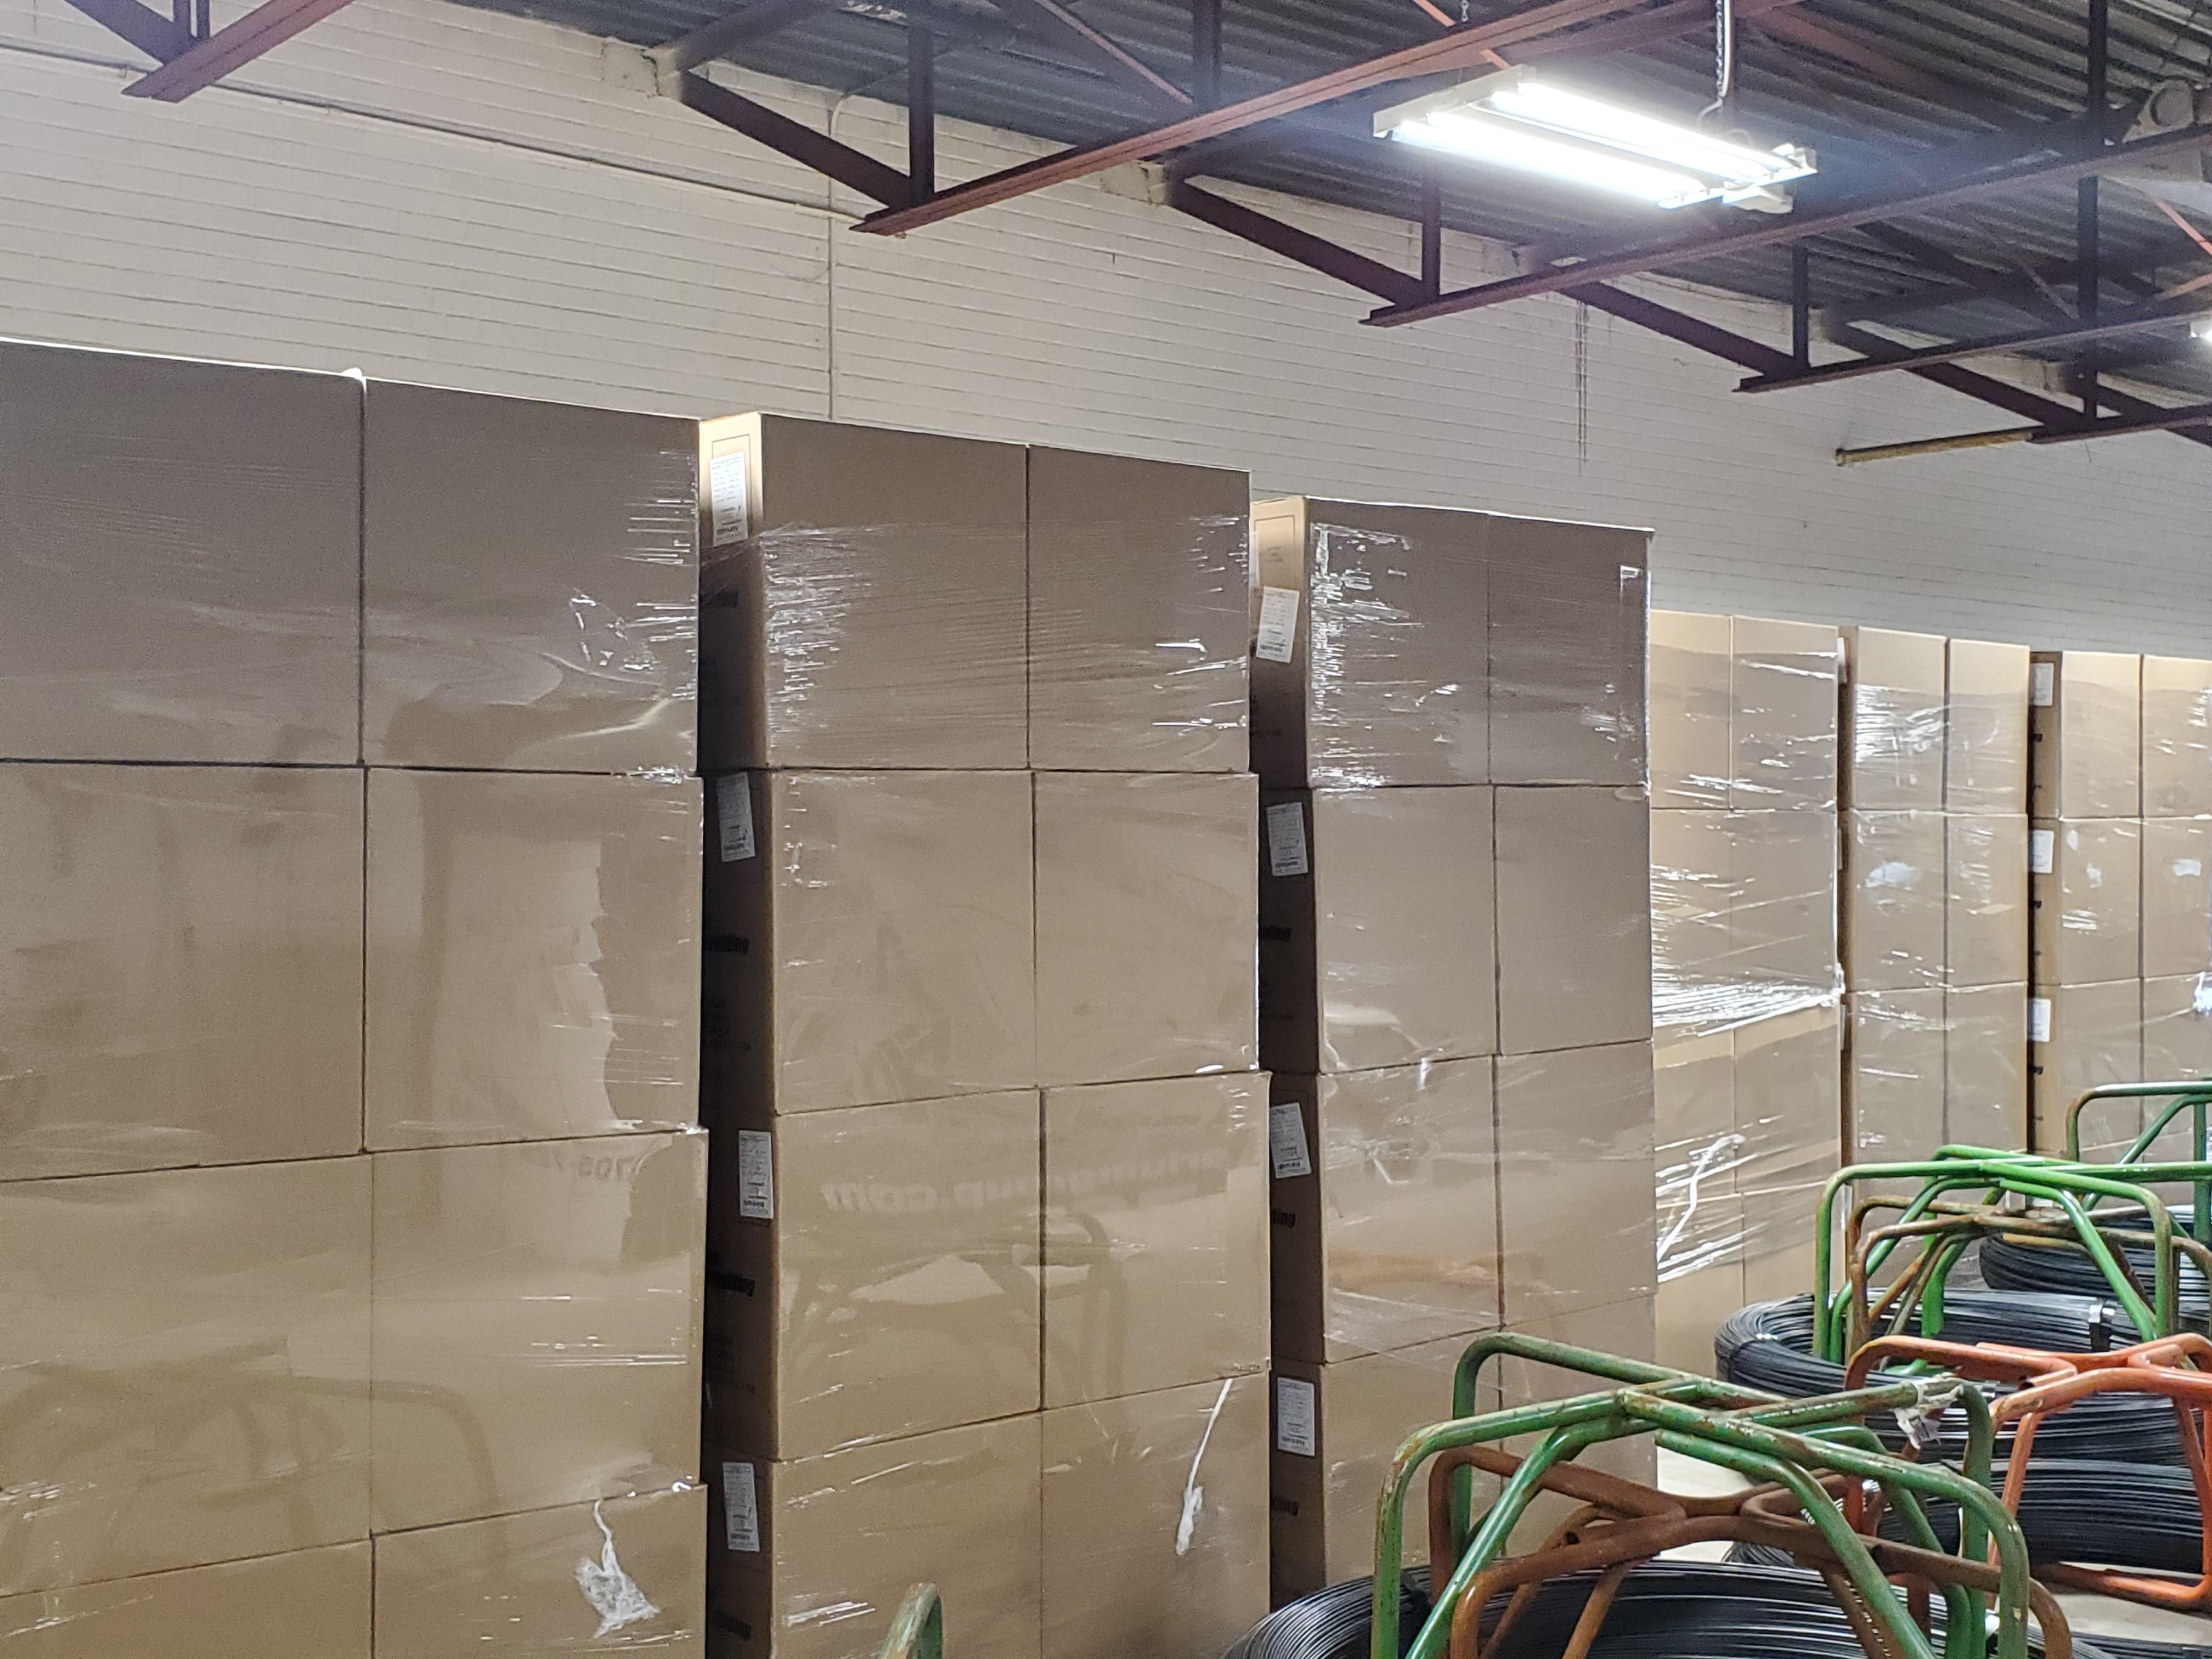 25,000 HDPE Bottles, NATURAL, NEW, 24/410 Neck, 16oz Boston Round - Image 3 of 6